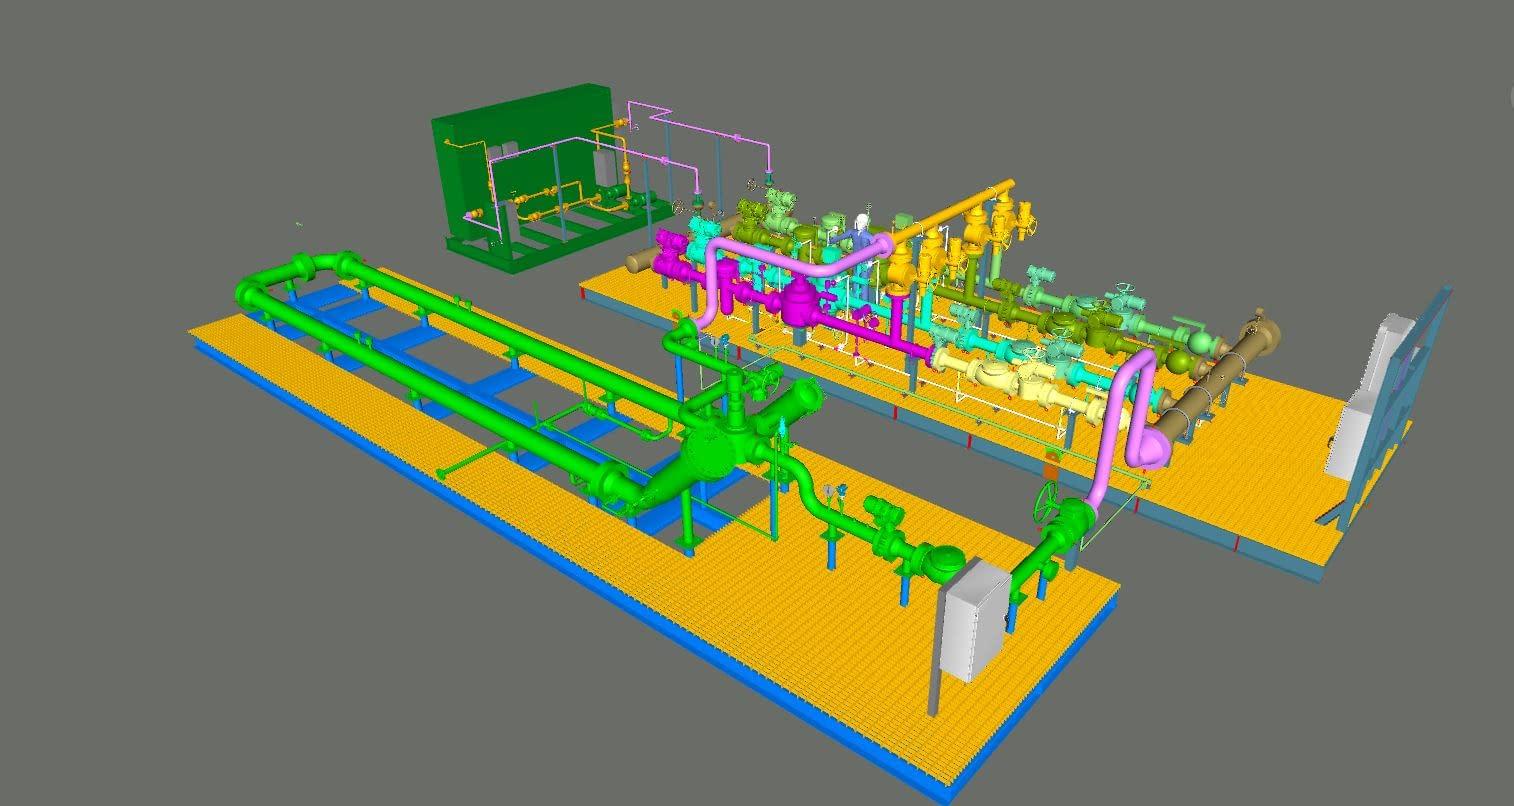 diesel hydrotreater modular